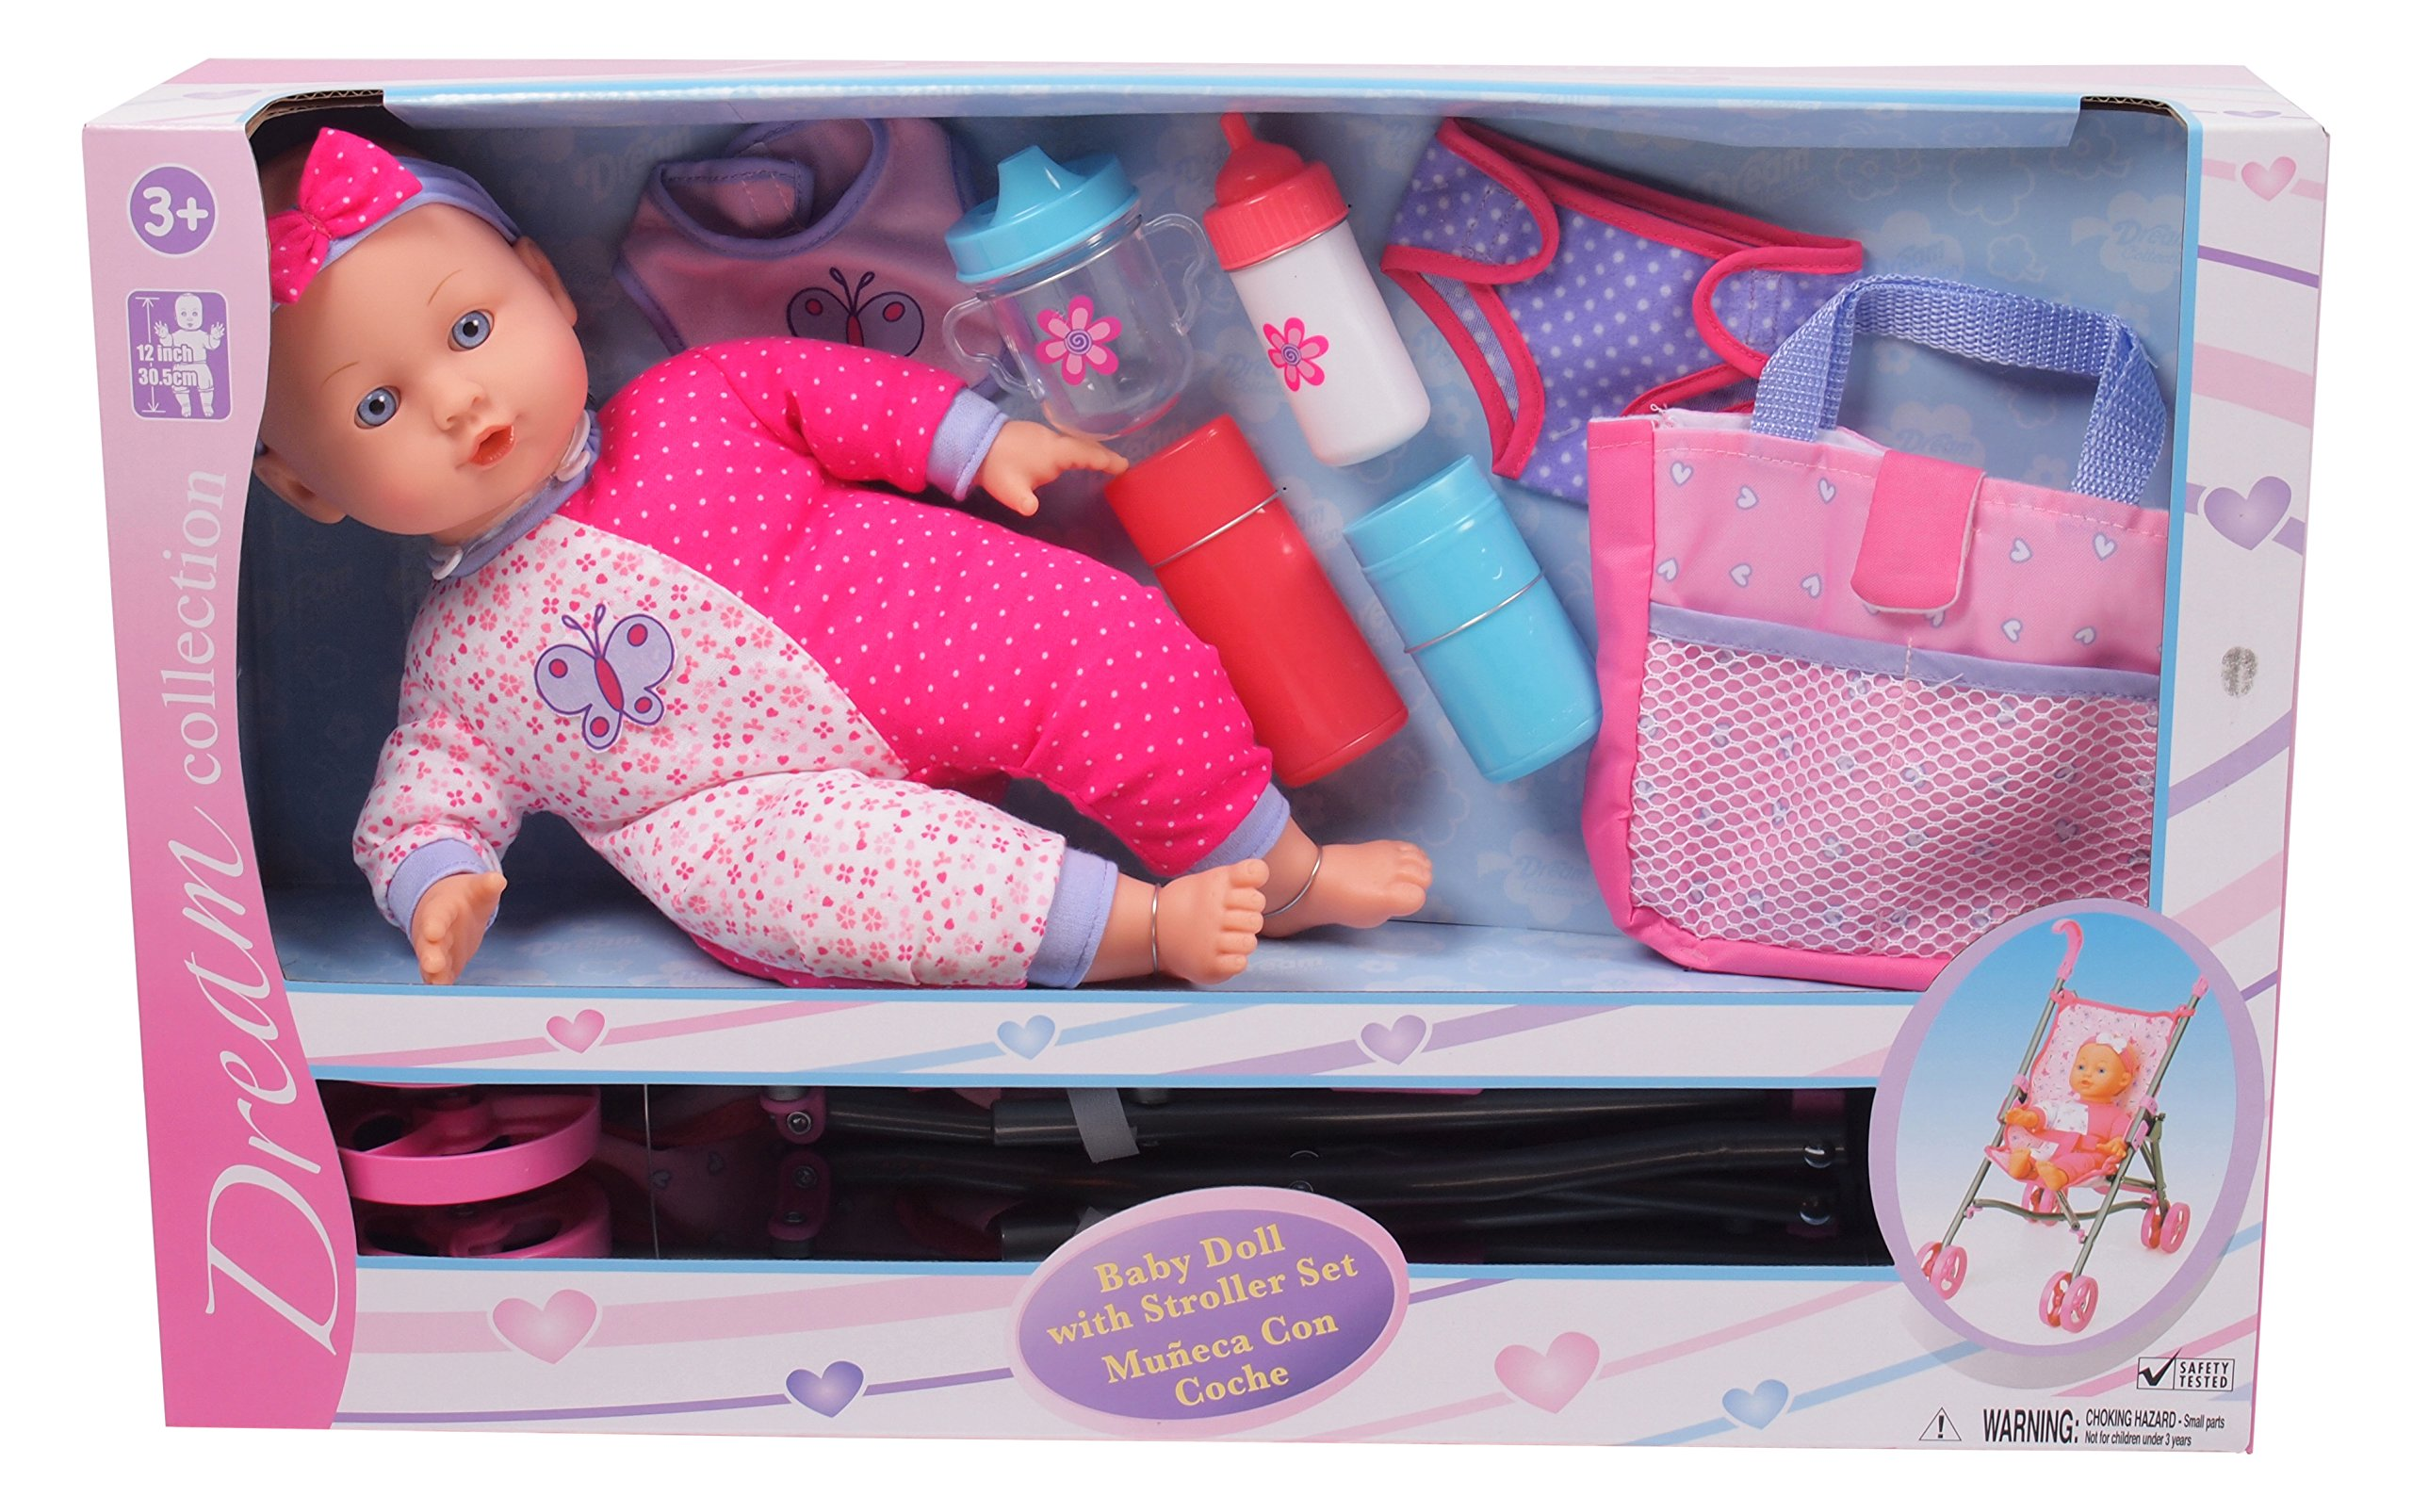 Gi-Go 14'' Baby Doll with Stroller Set